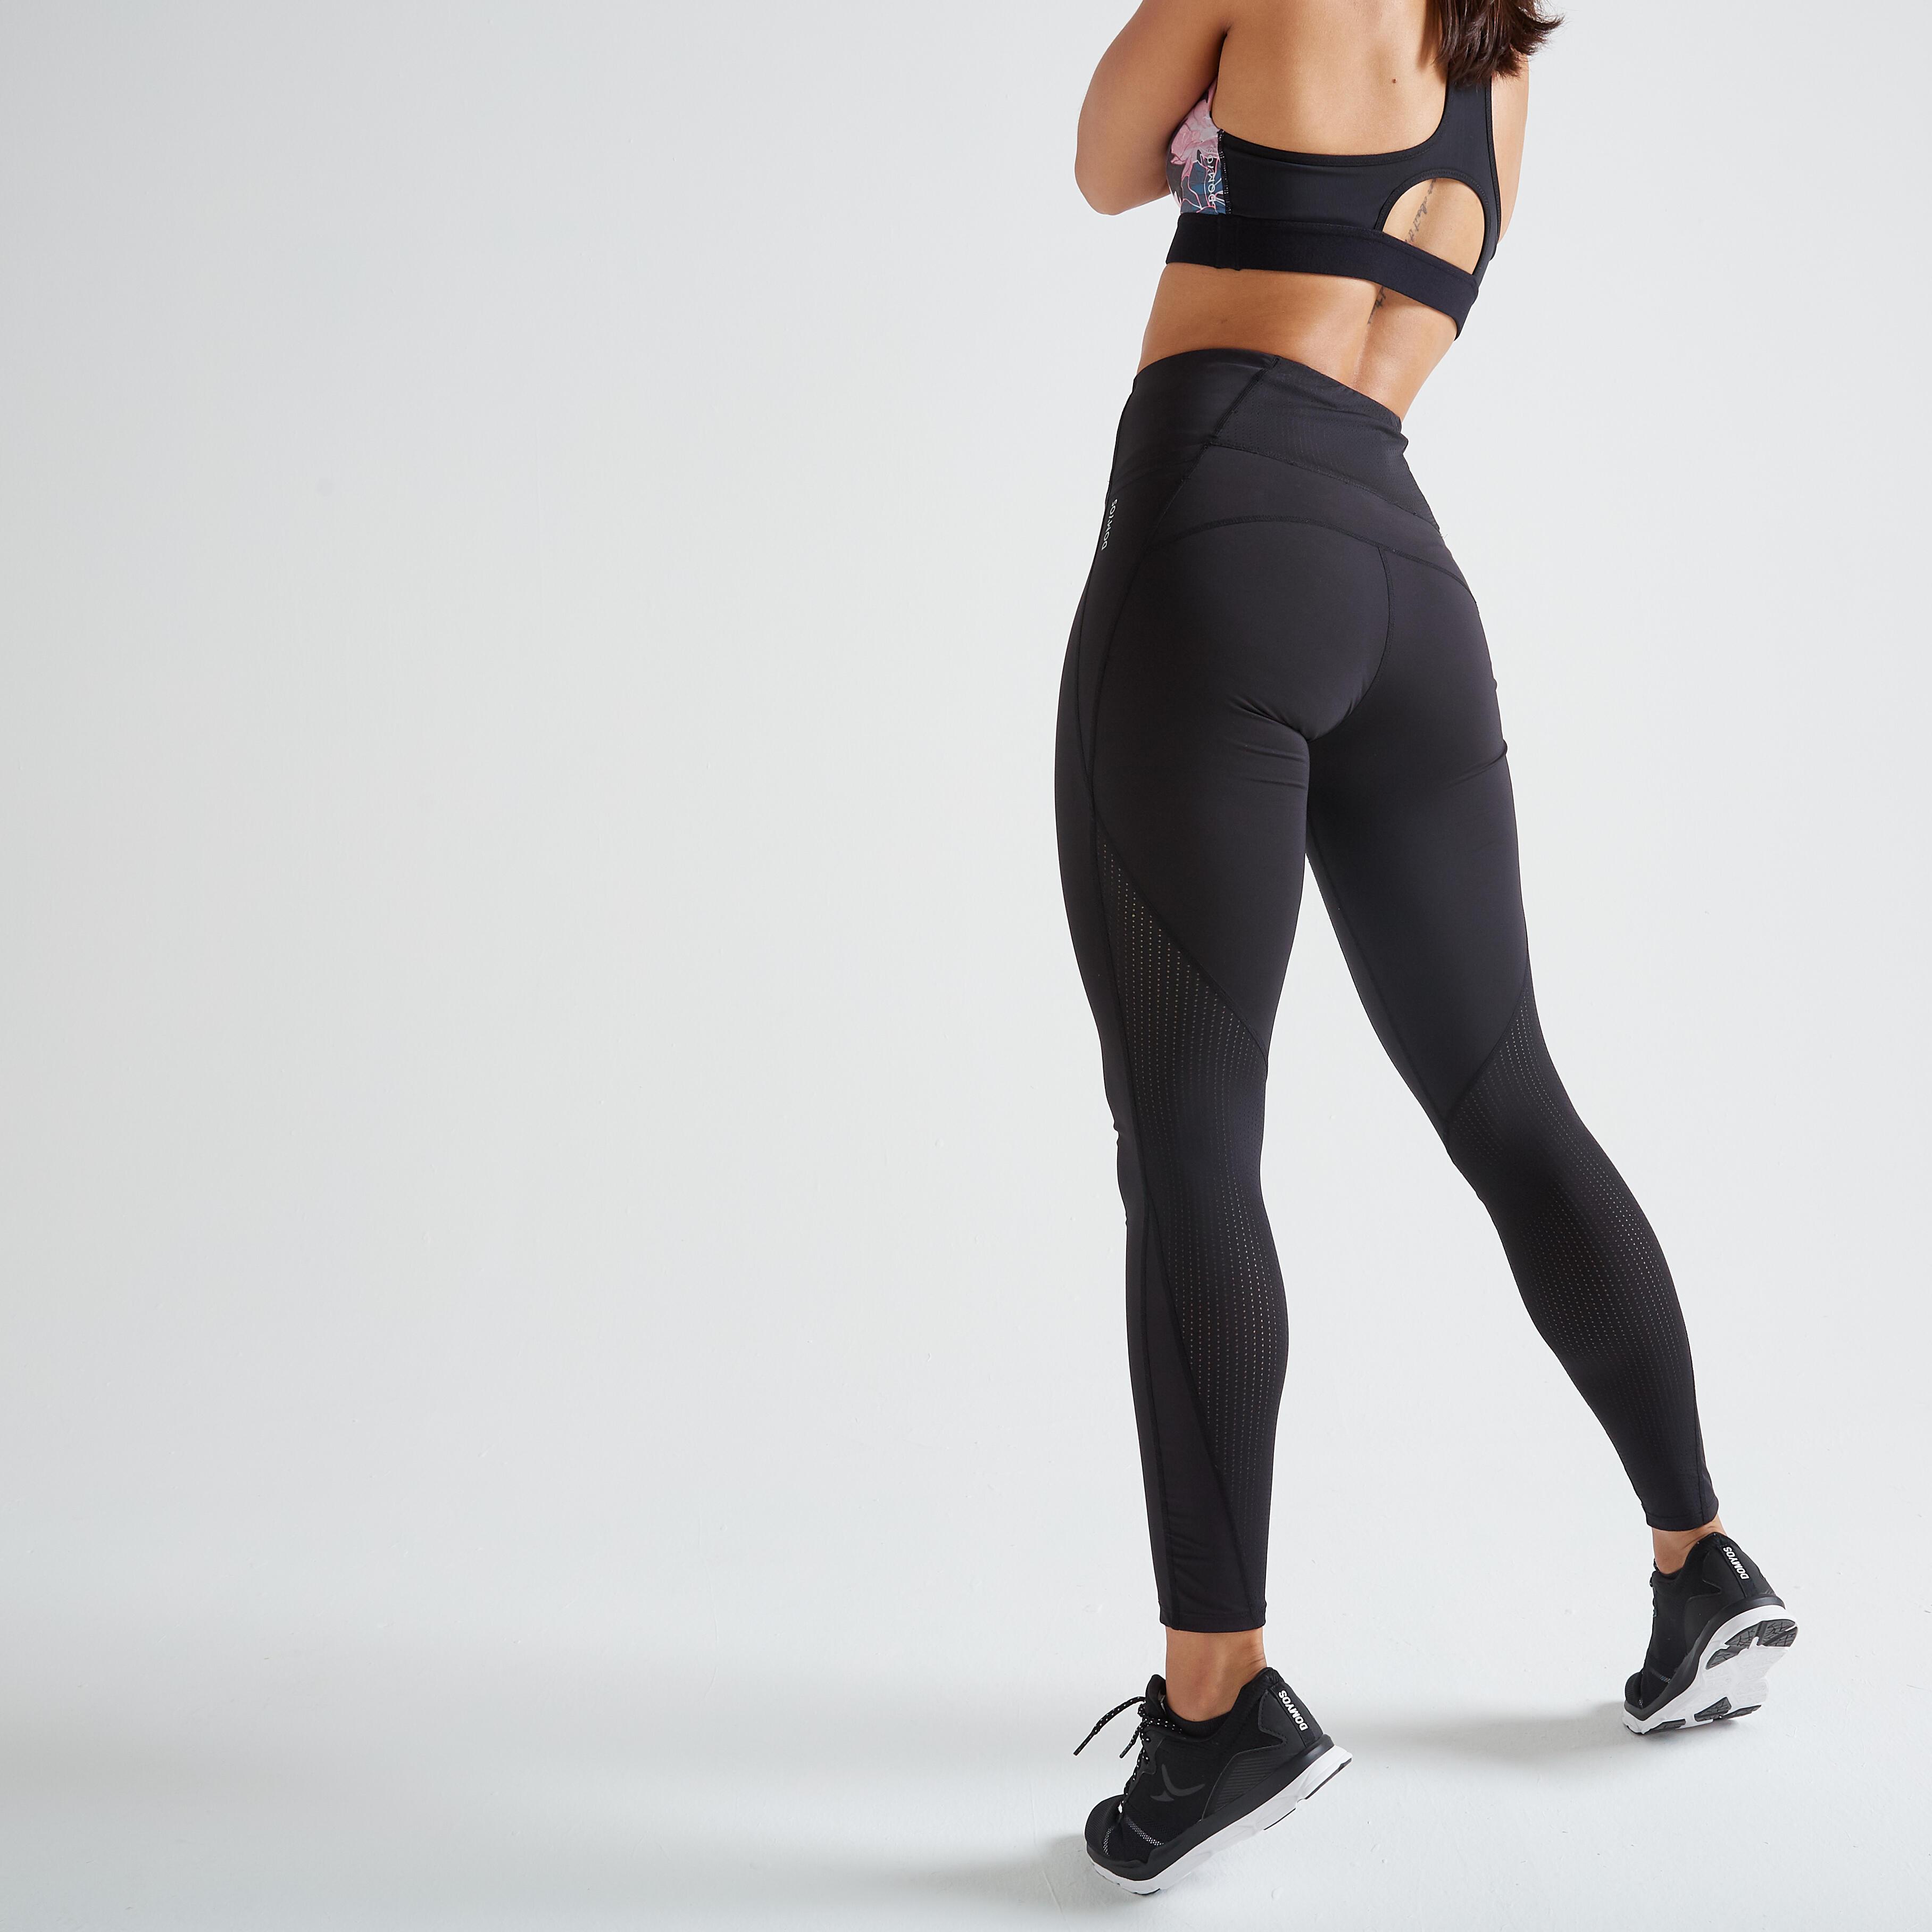 Domyos Legging fitness cardio training femme noir 500 - Domyos